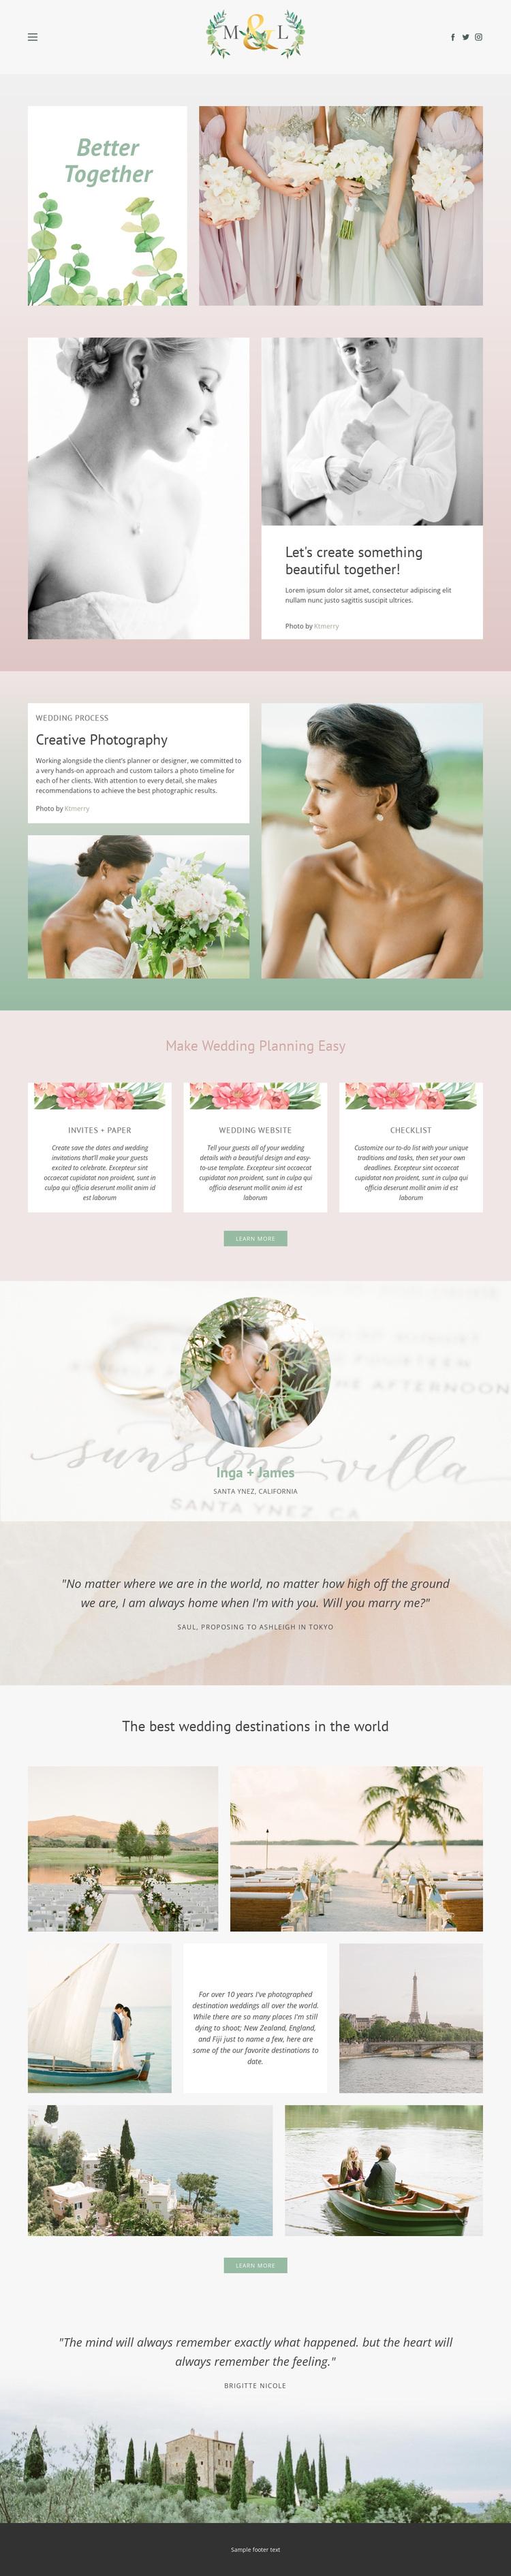 Best photos for wedding Joomla Page Builder